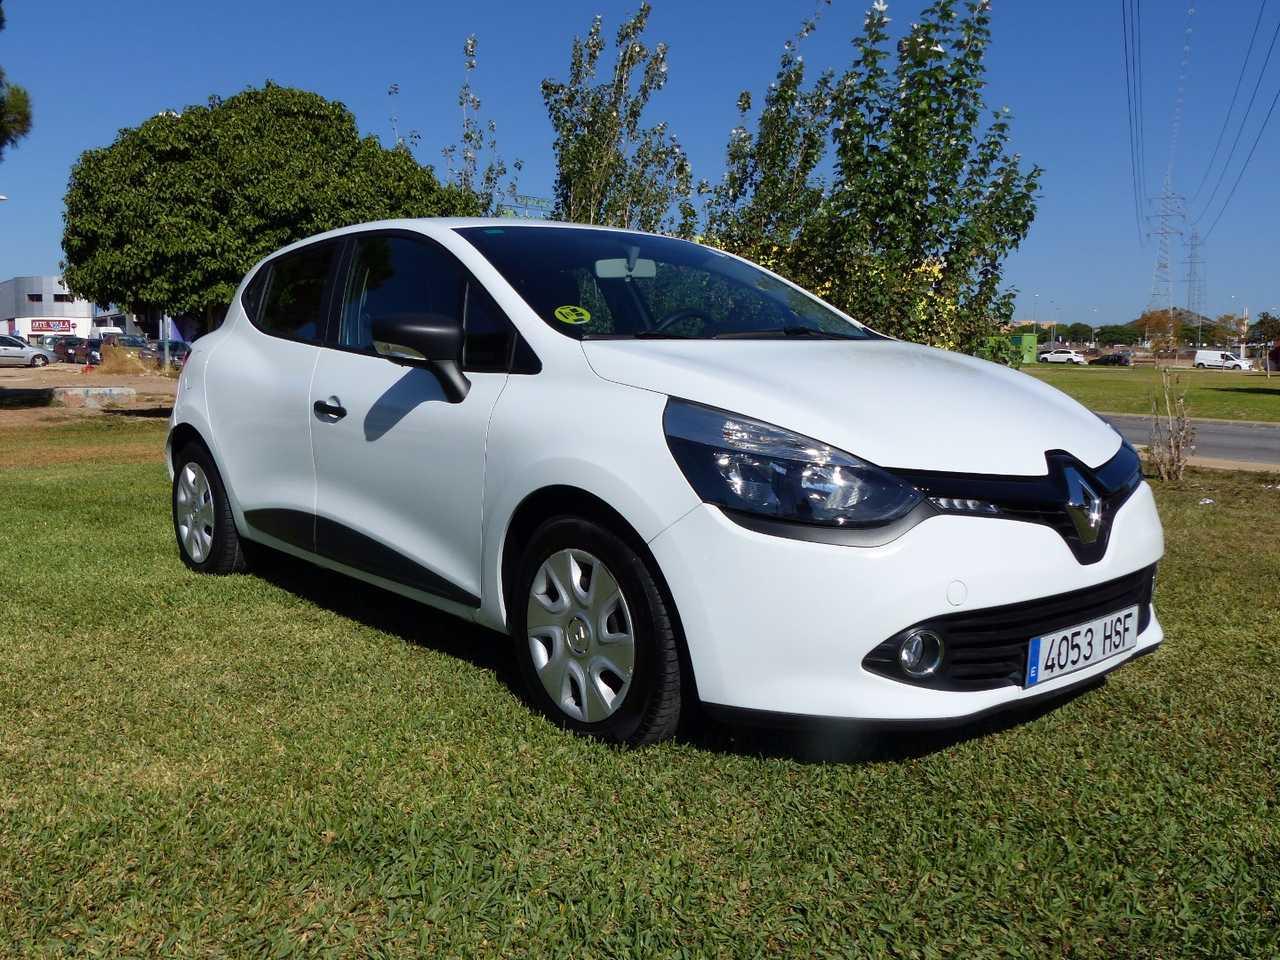 Renault Clio BUSSINES DCI 75 ECO2 DE USO PRIVADO NO ALQUILER   - Foto 1